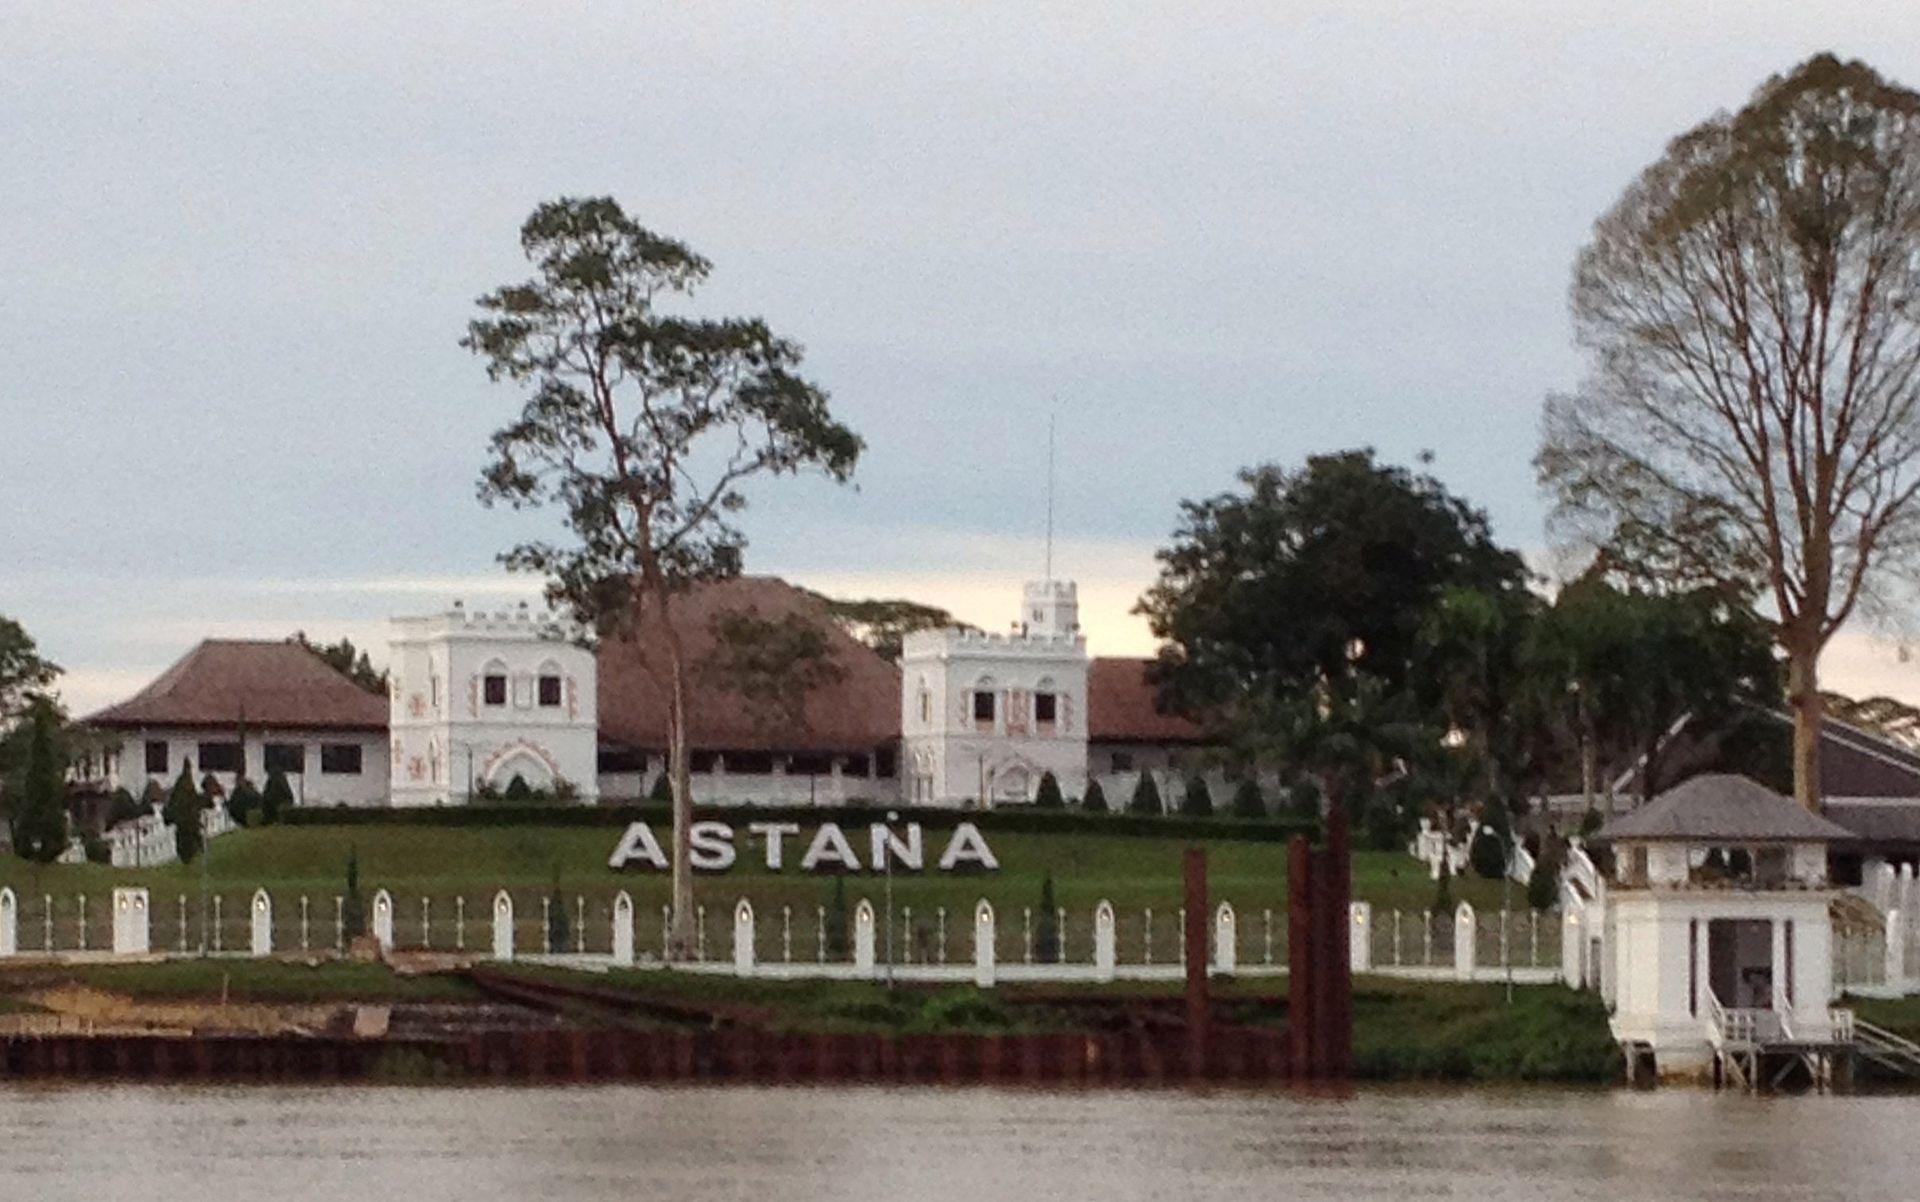 The Astana, Sarawak - Wikipedia